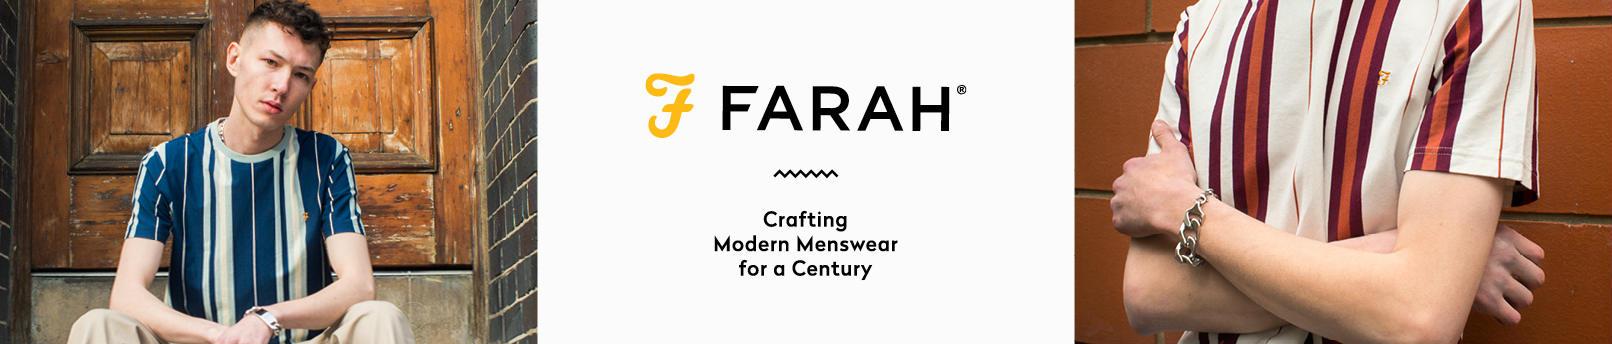 Shop Farah